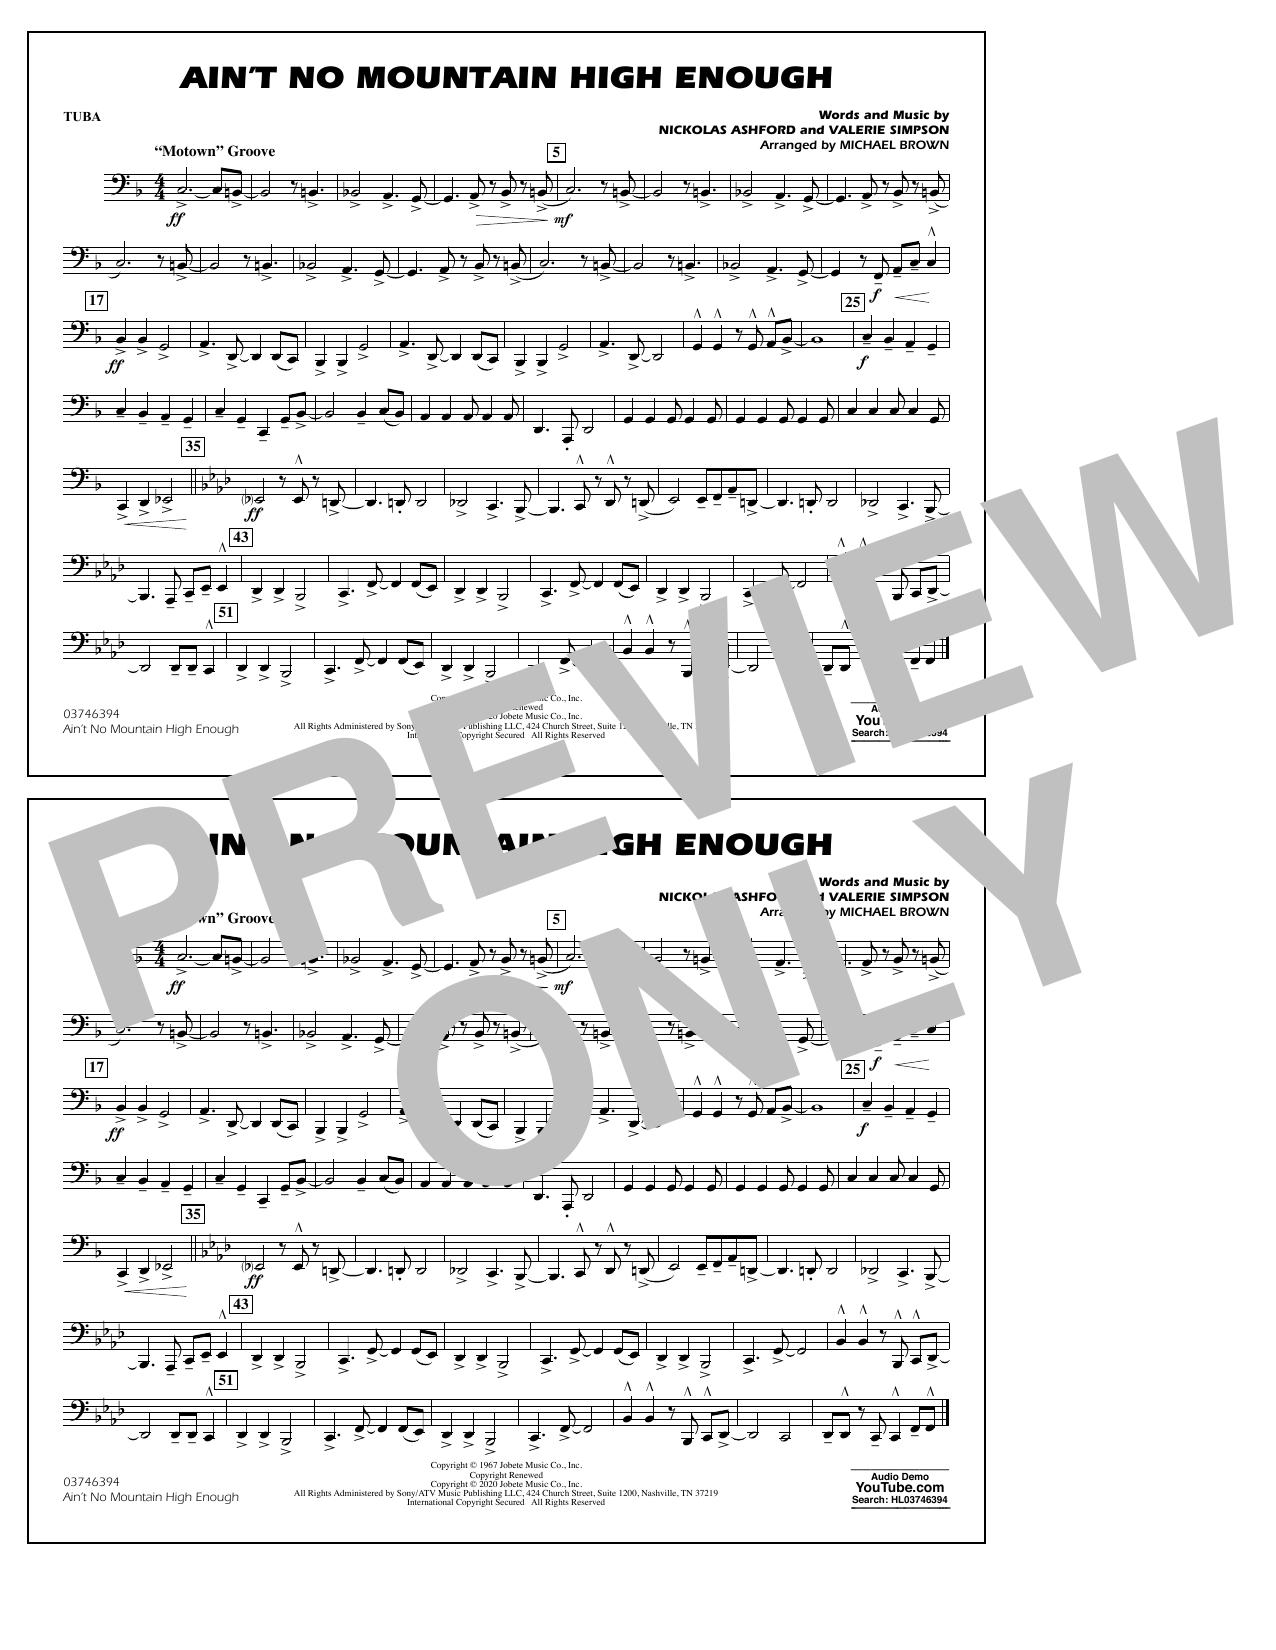 Ain't No Mountain High Enough (arr. Michael Brown) - Tuba Sheet Music